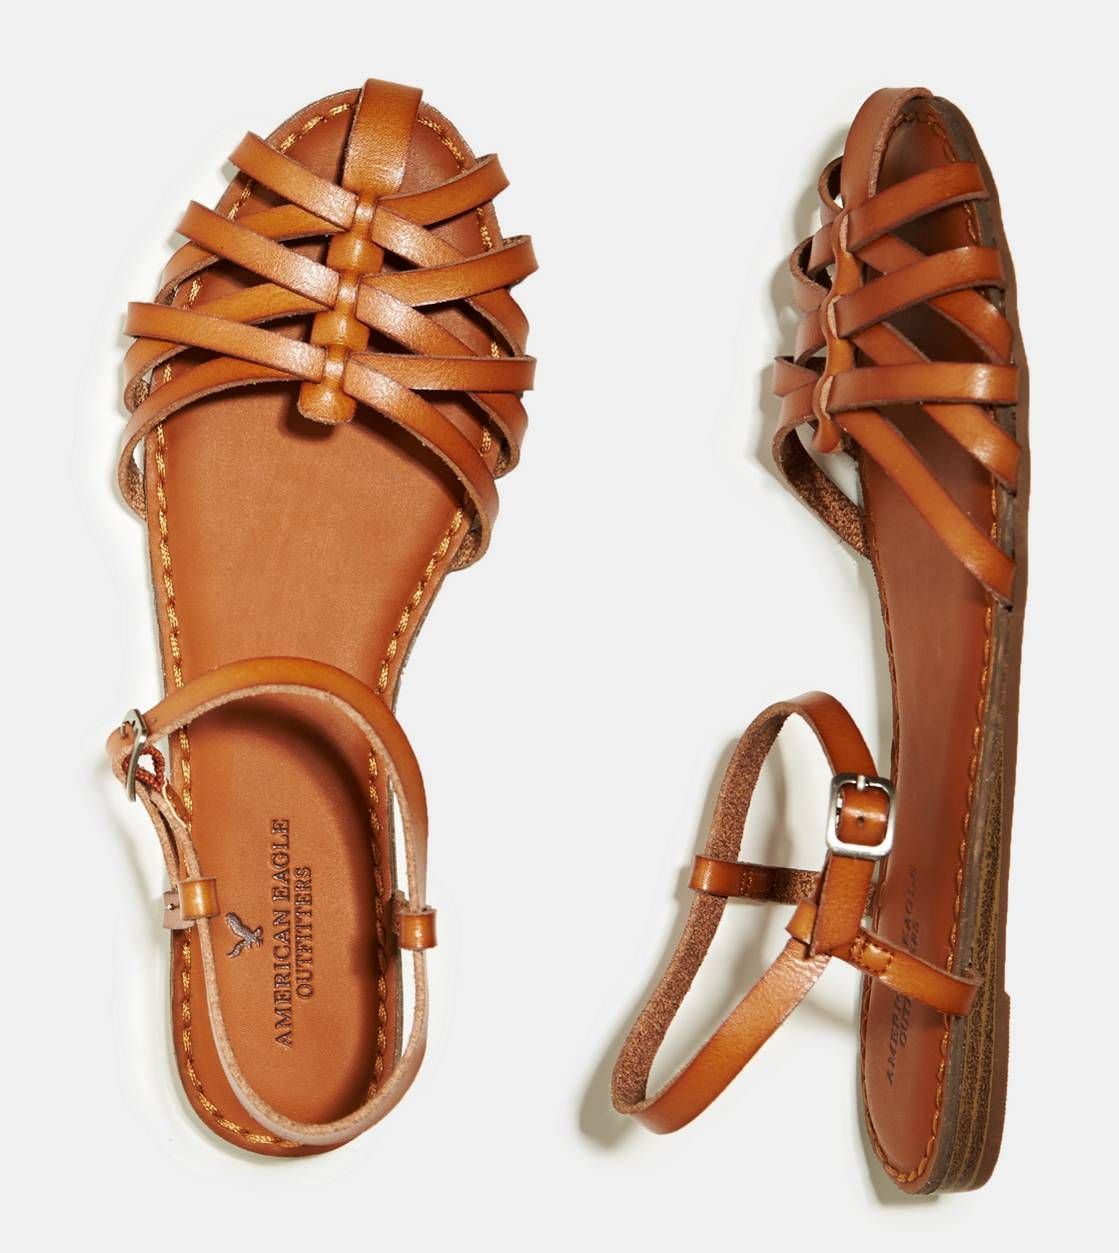 5886aa79feaf8 Tan Fisherman Sandals-American Eagle  29.95